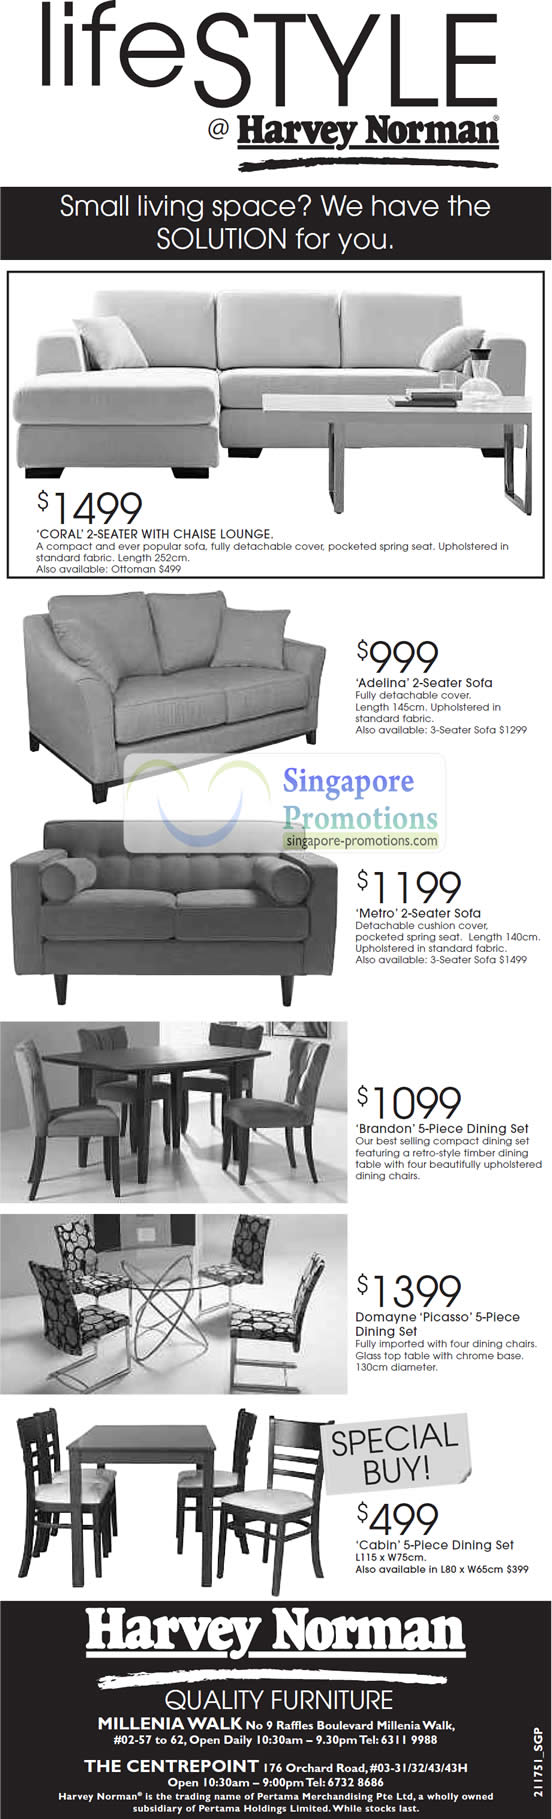 Furniture Coral Chaise Lounge Seater Sofa Adalina Metro